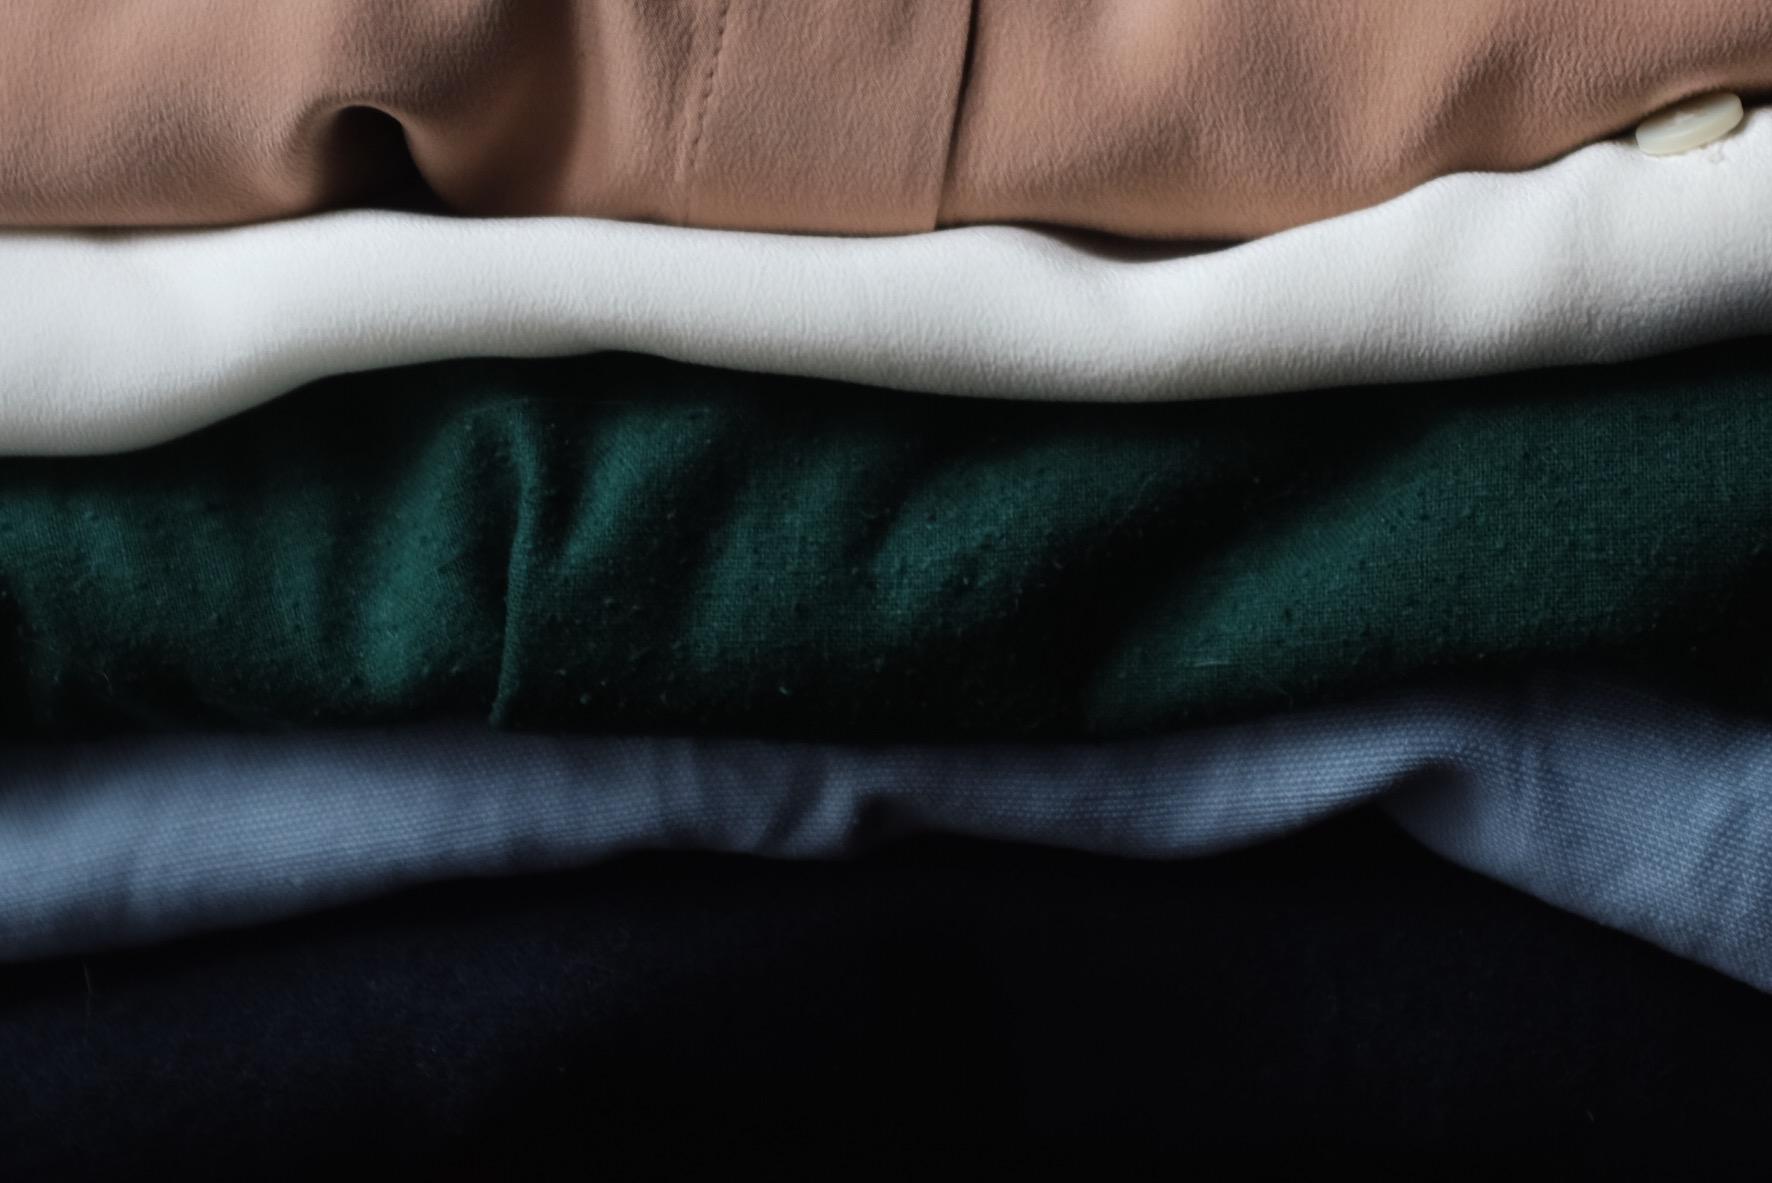 (Top to bottom) Everlane Modern Silk Blouse in Blush, Everlane the  Silk Round Collar in White , Jamie + the Jones  T Top in Emerald , Reformation Carmen dress in Skye, Elizabeth Suzann Andy Trouser in Navy.